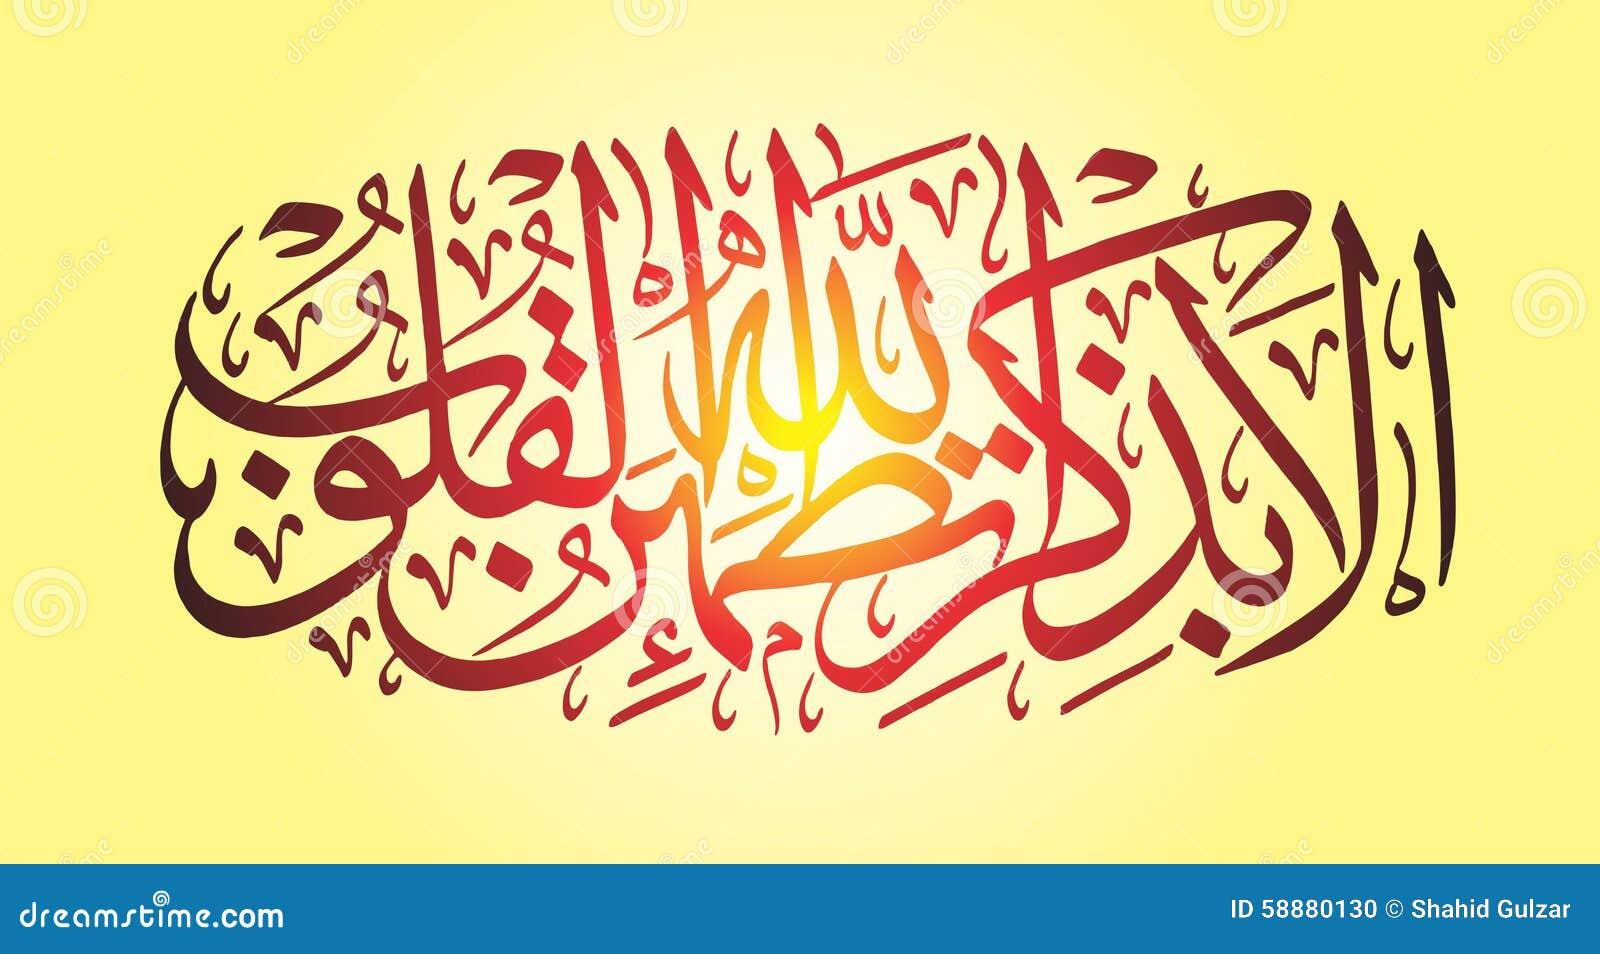 Ala Bzikrilahe Tatmainal Qalub Islami Calligraphy